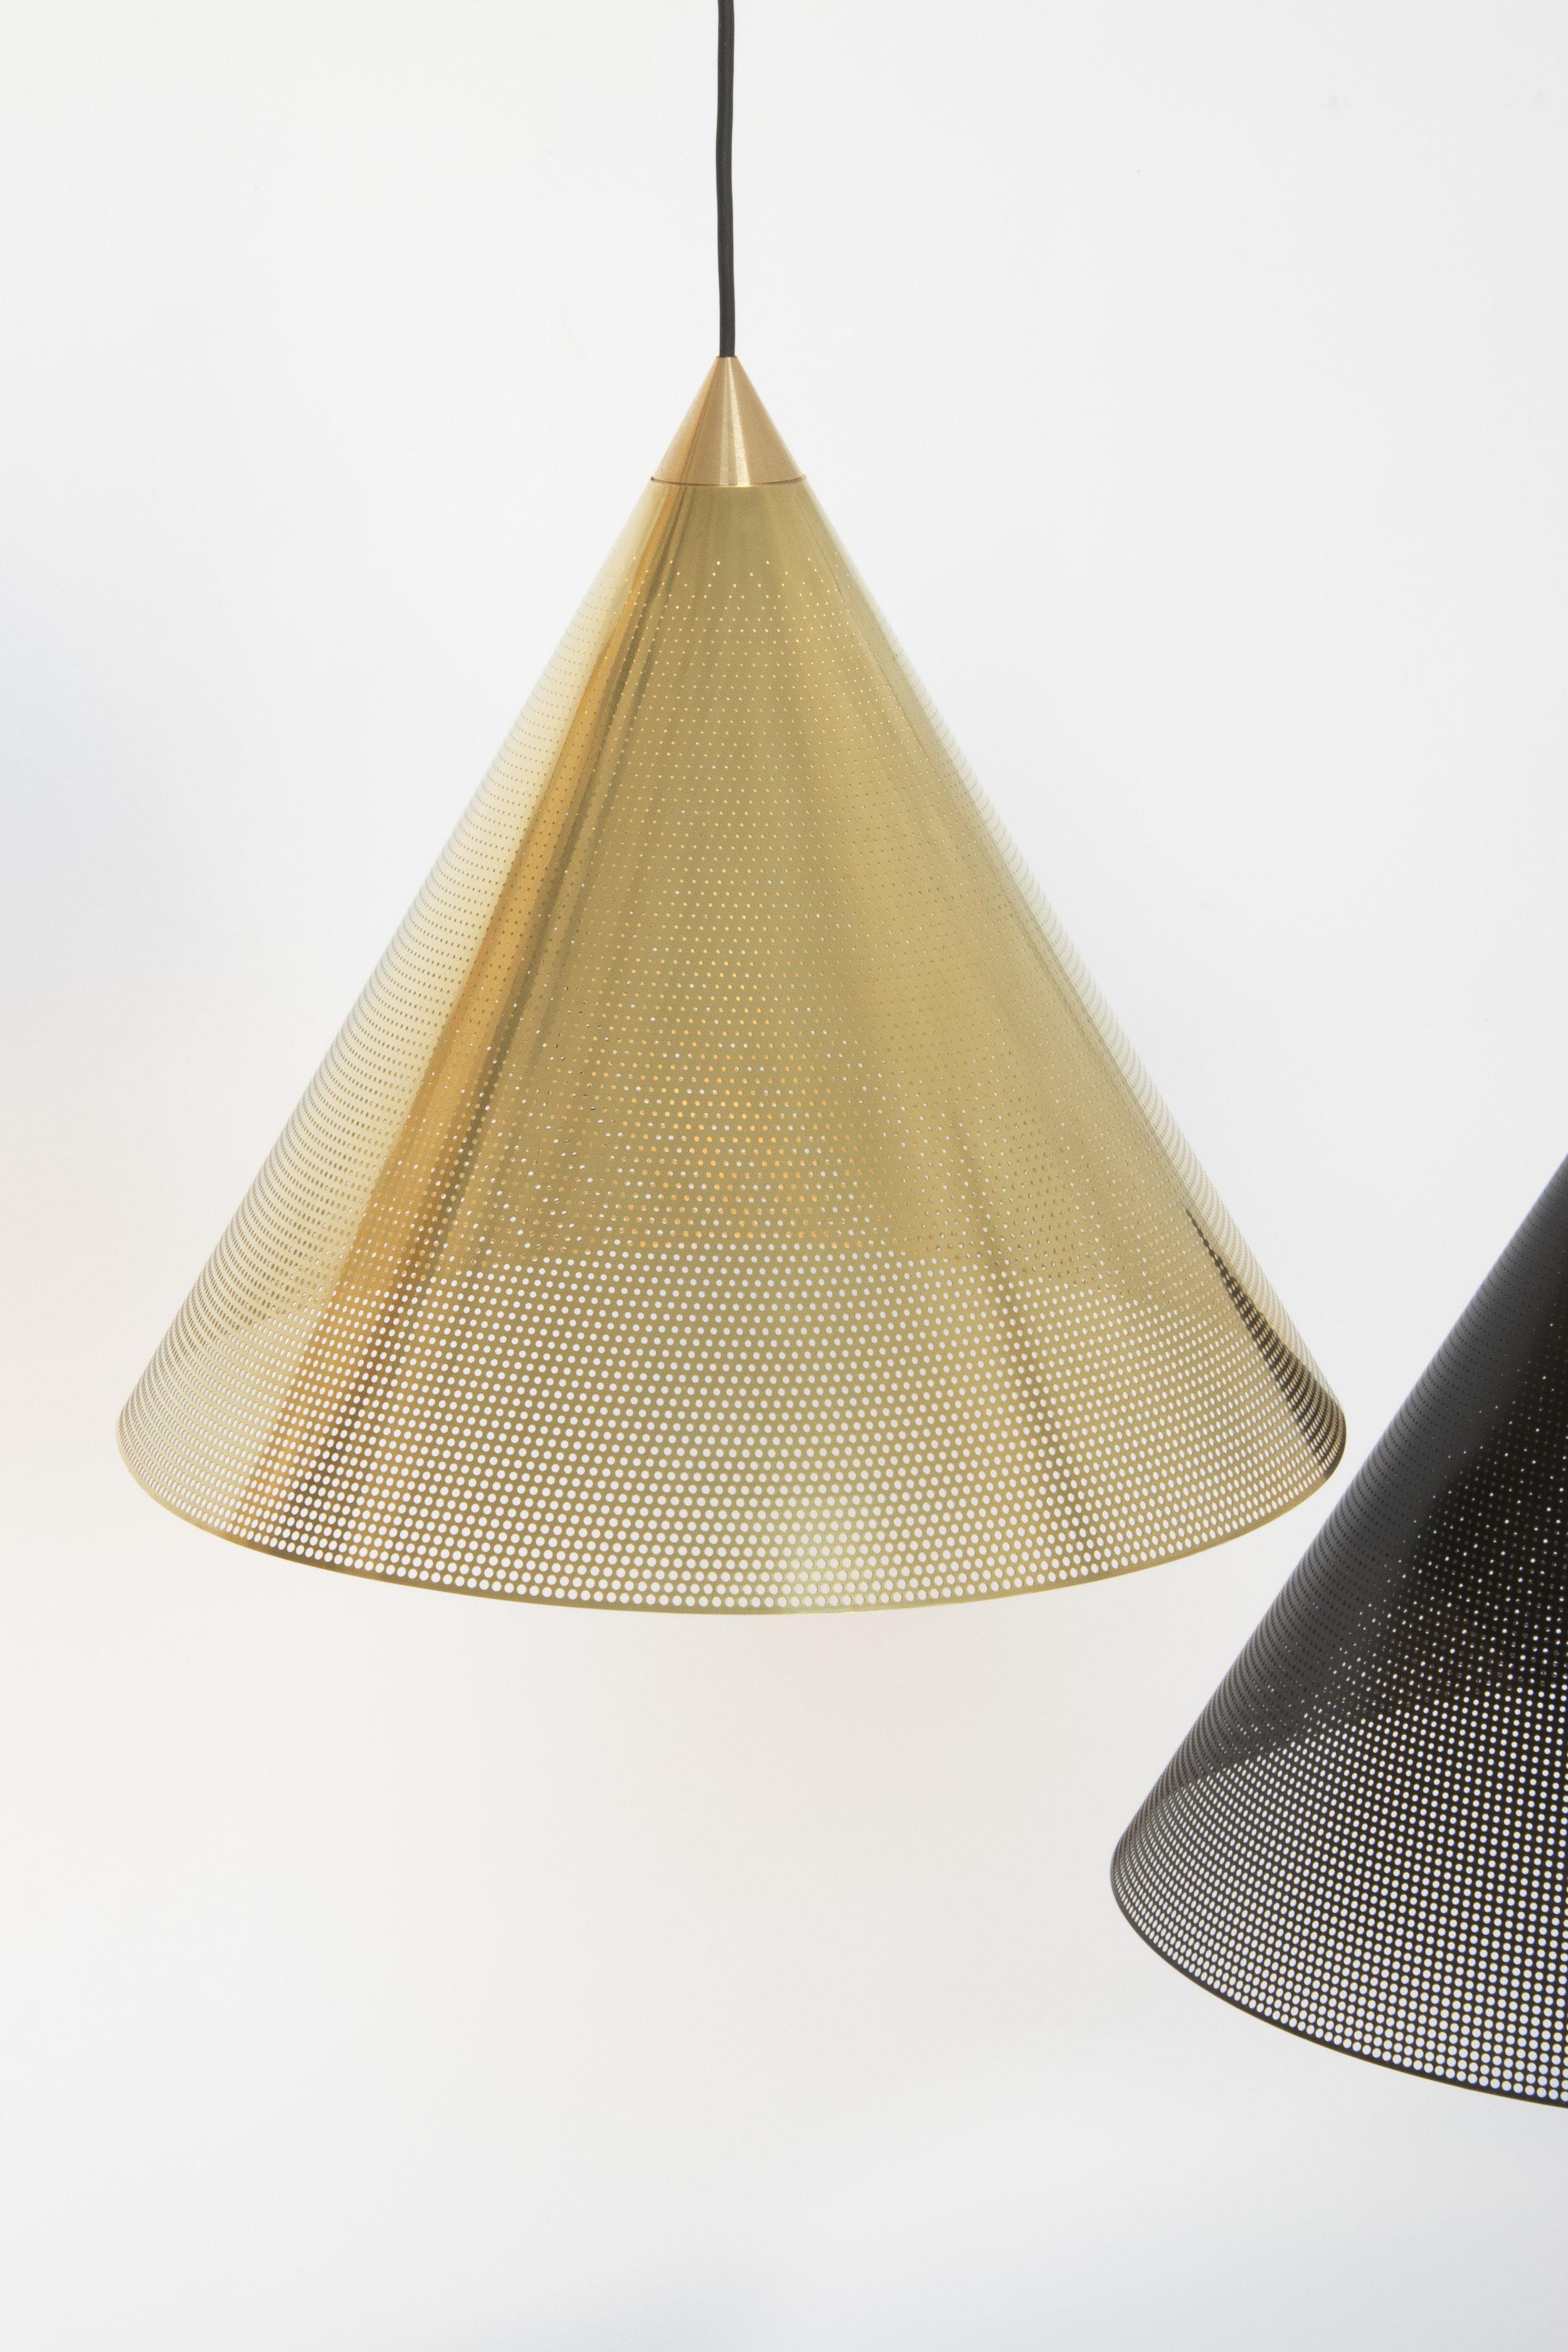 Lucid Lights pendant - David Derksen Design.jpg